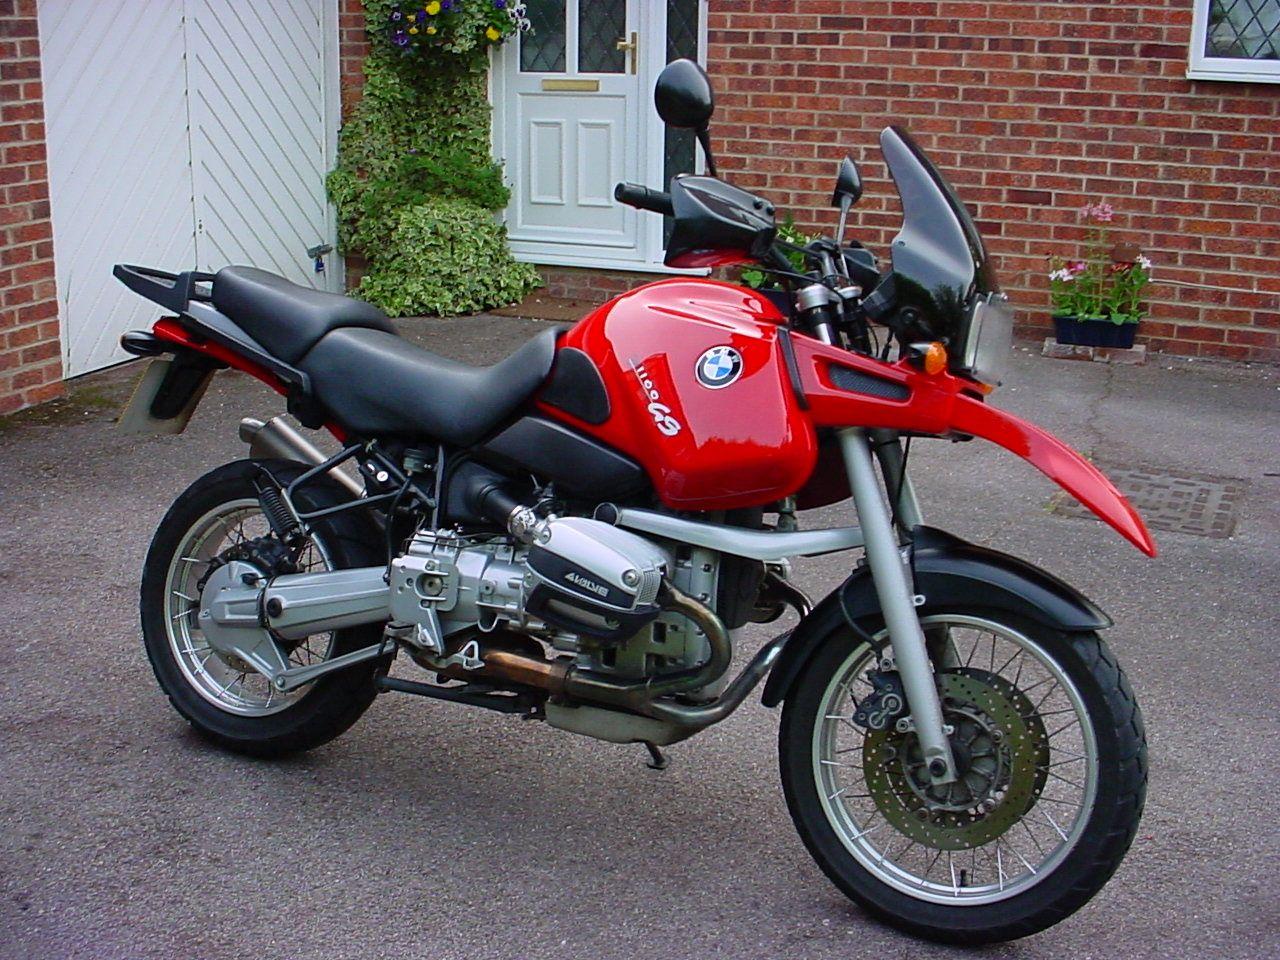 R 1100 Gs Cyclomoteur 1200 Gs Enduro